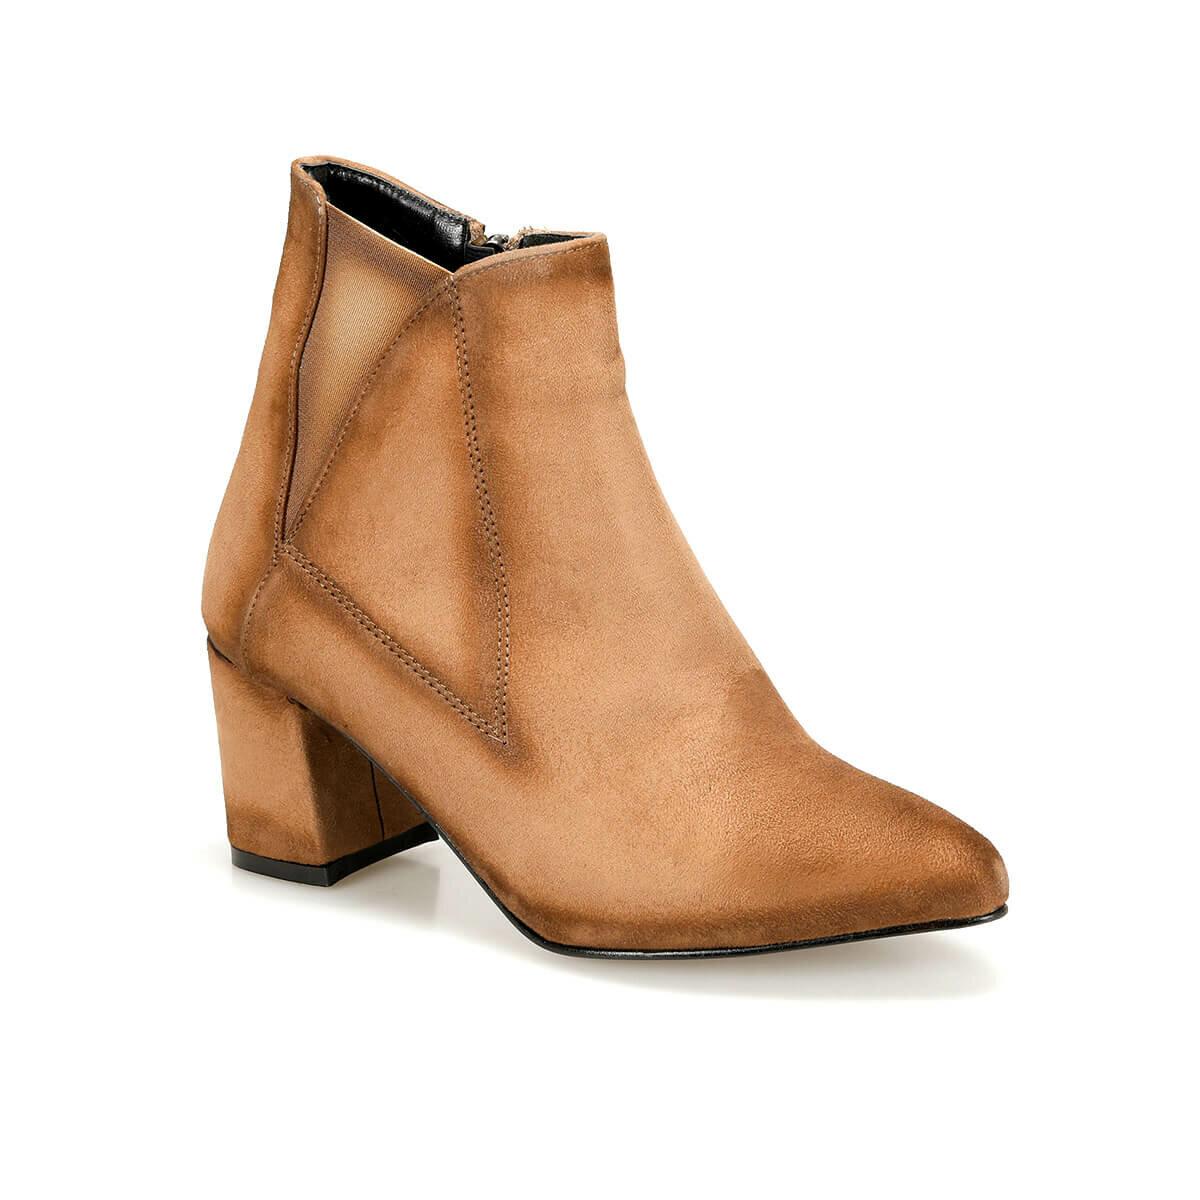 FLO VESLEY11Z SHEEPSKIN Mink Women 'S Boots BUTIGO